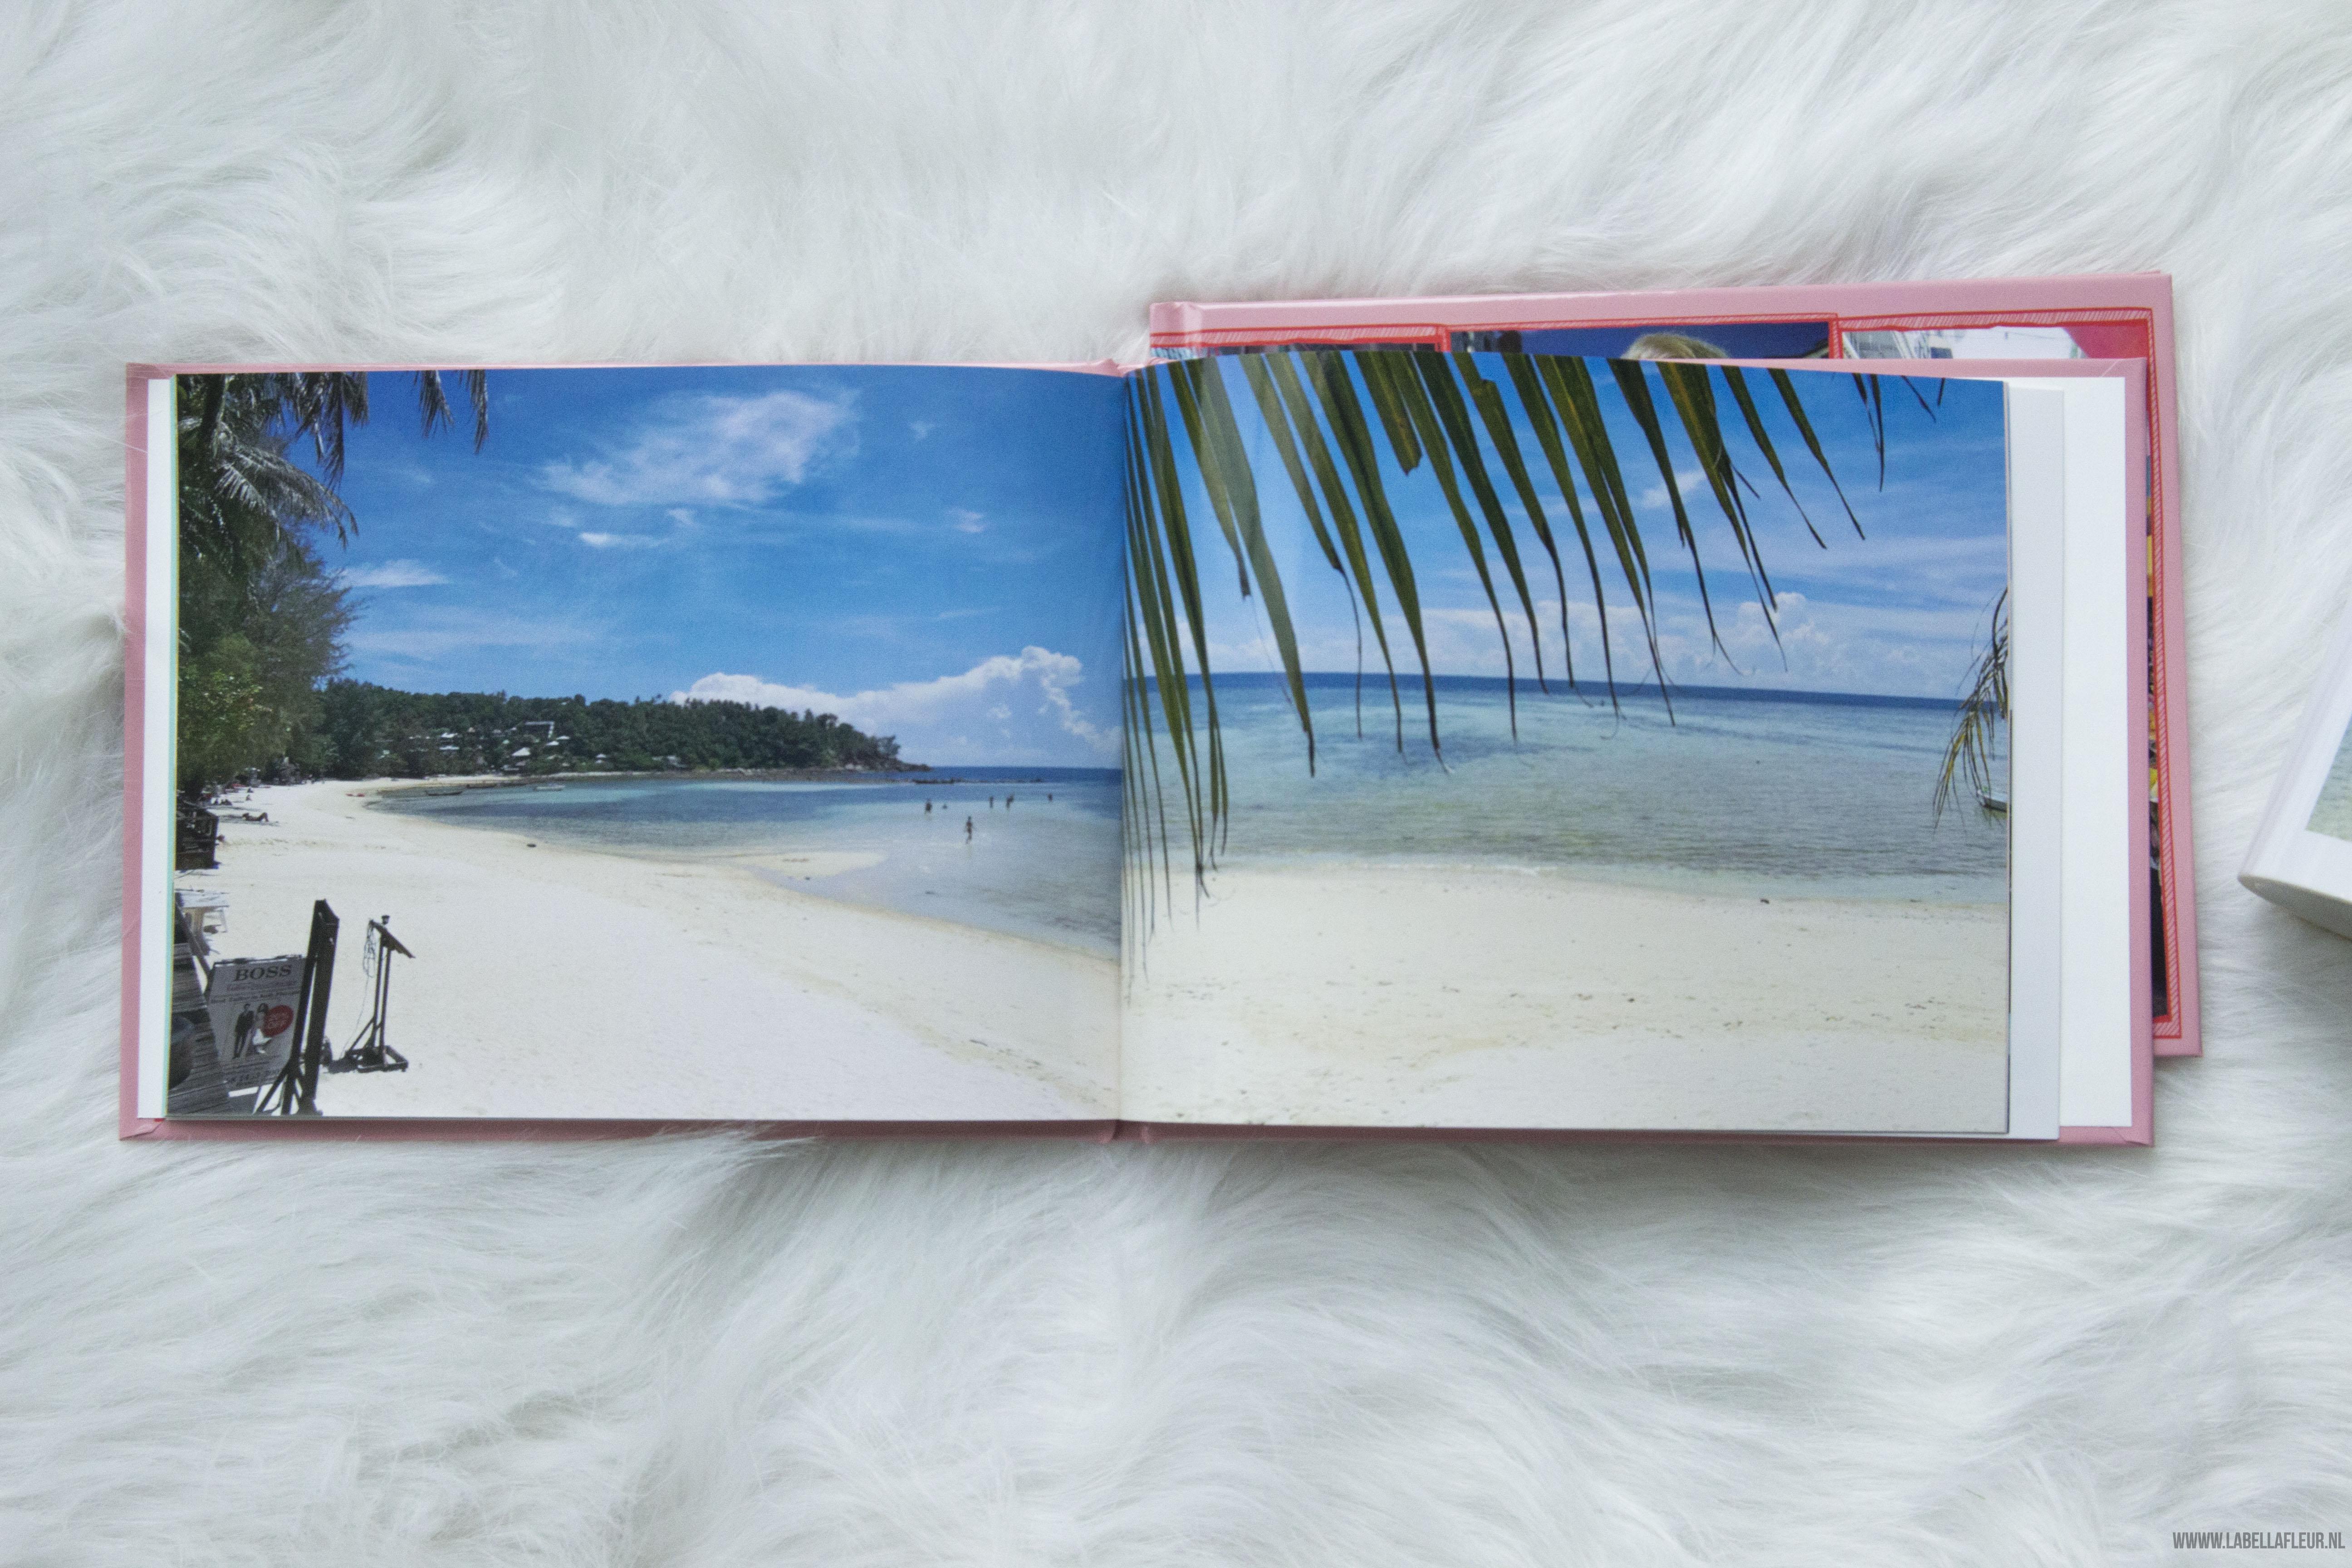 Albelli, fotoboek, thailand